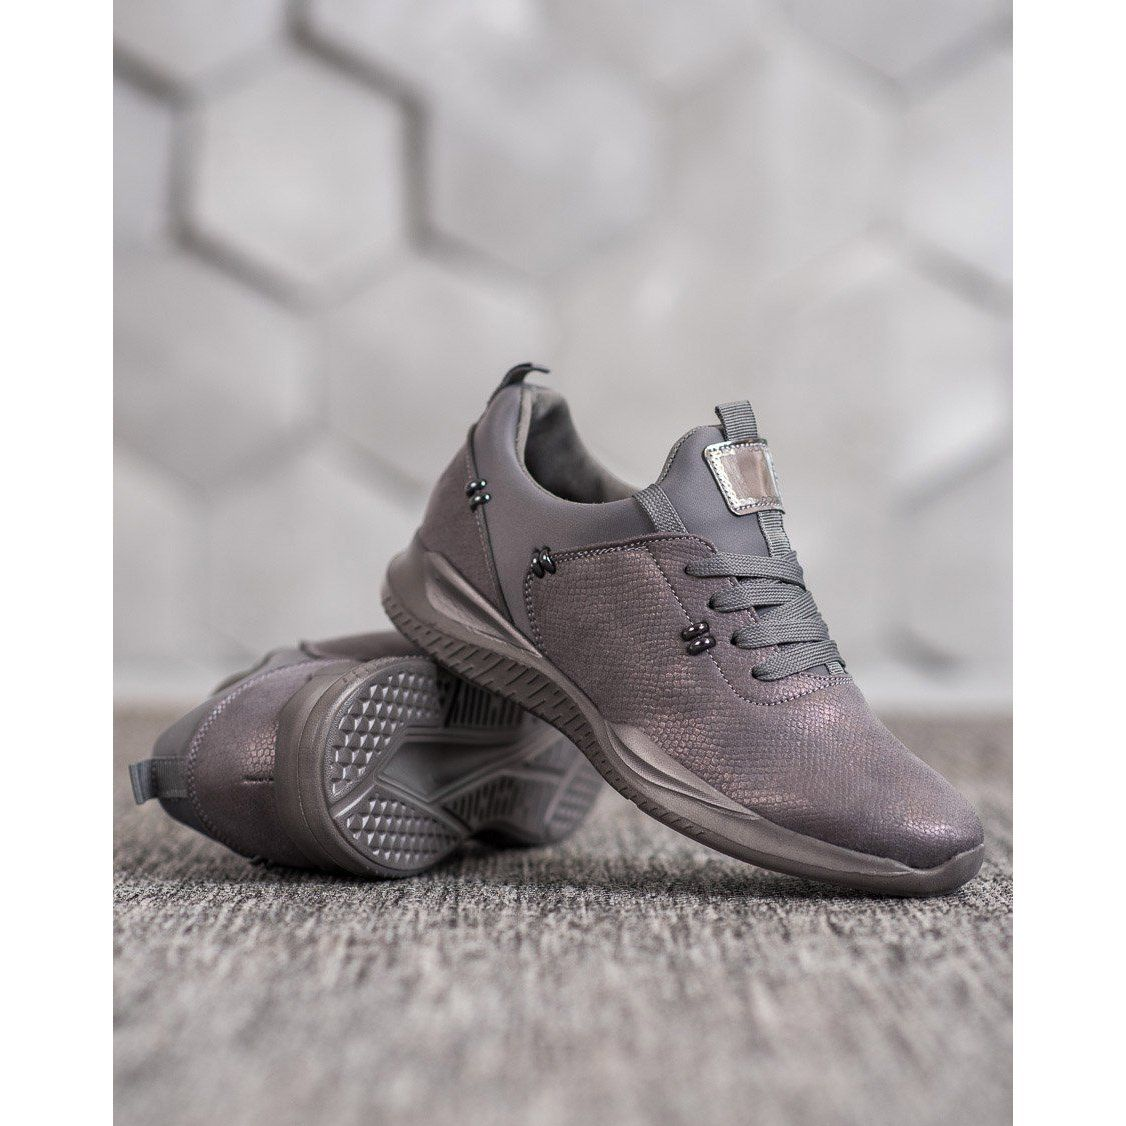 Shelovet Stylowe Buty Sportowe Szare Dress Shoes Men Oxford Shoes Black Sneaker